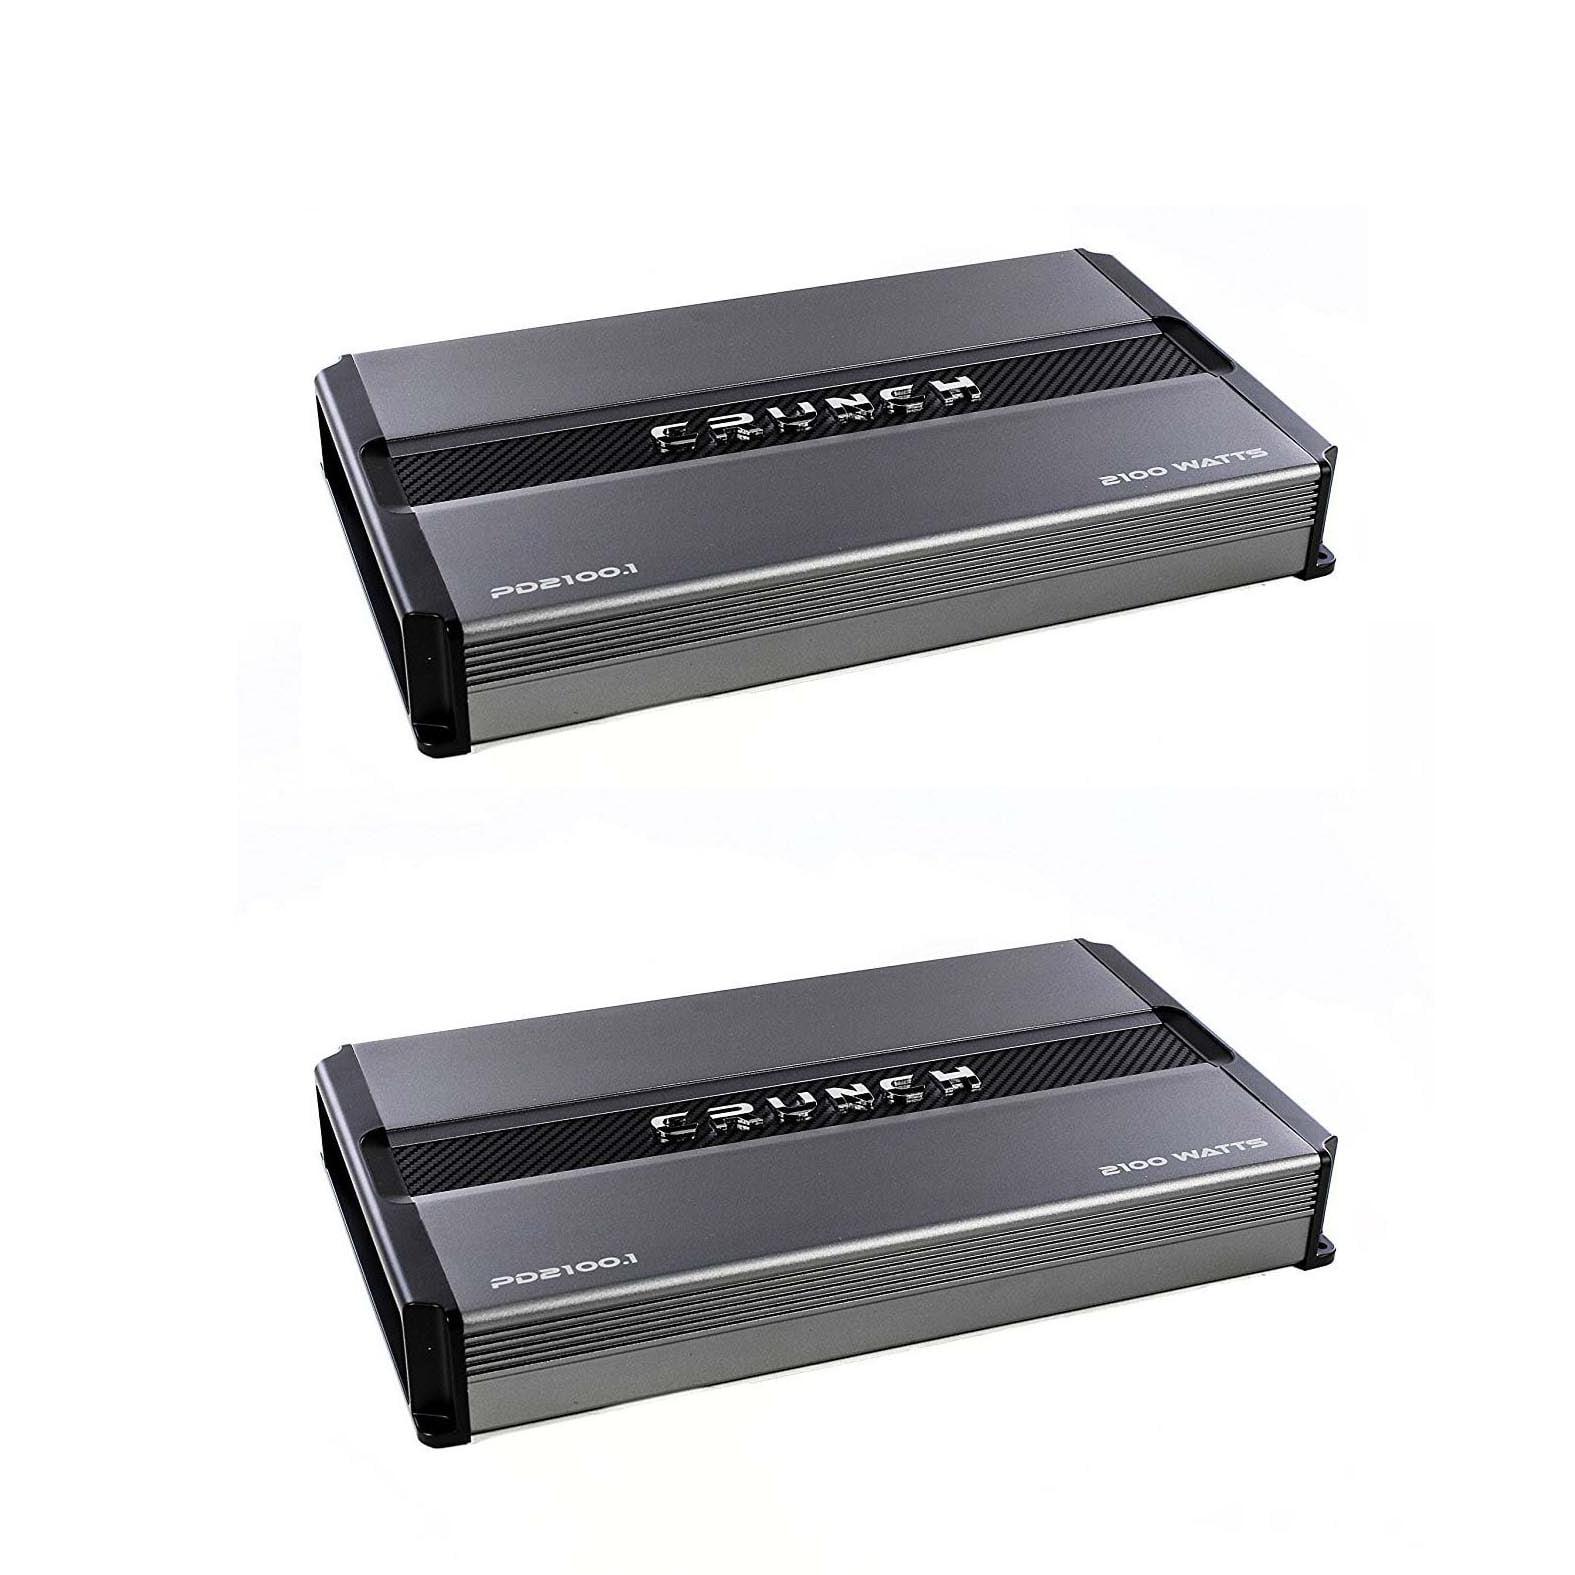 Crunch Power Drive 2100W Max Monoblock Class A/B Car Audio Amplifier (2 Pack)